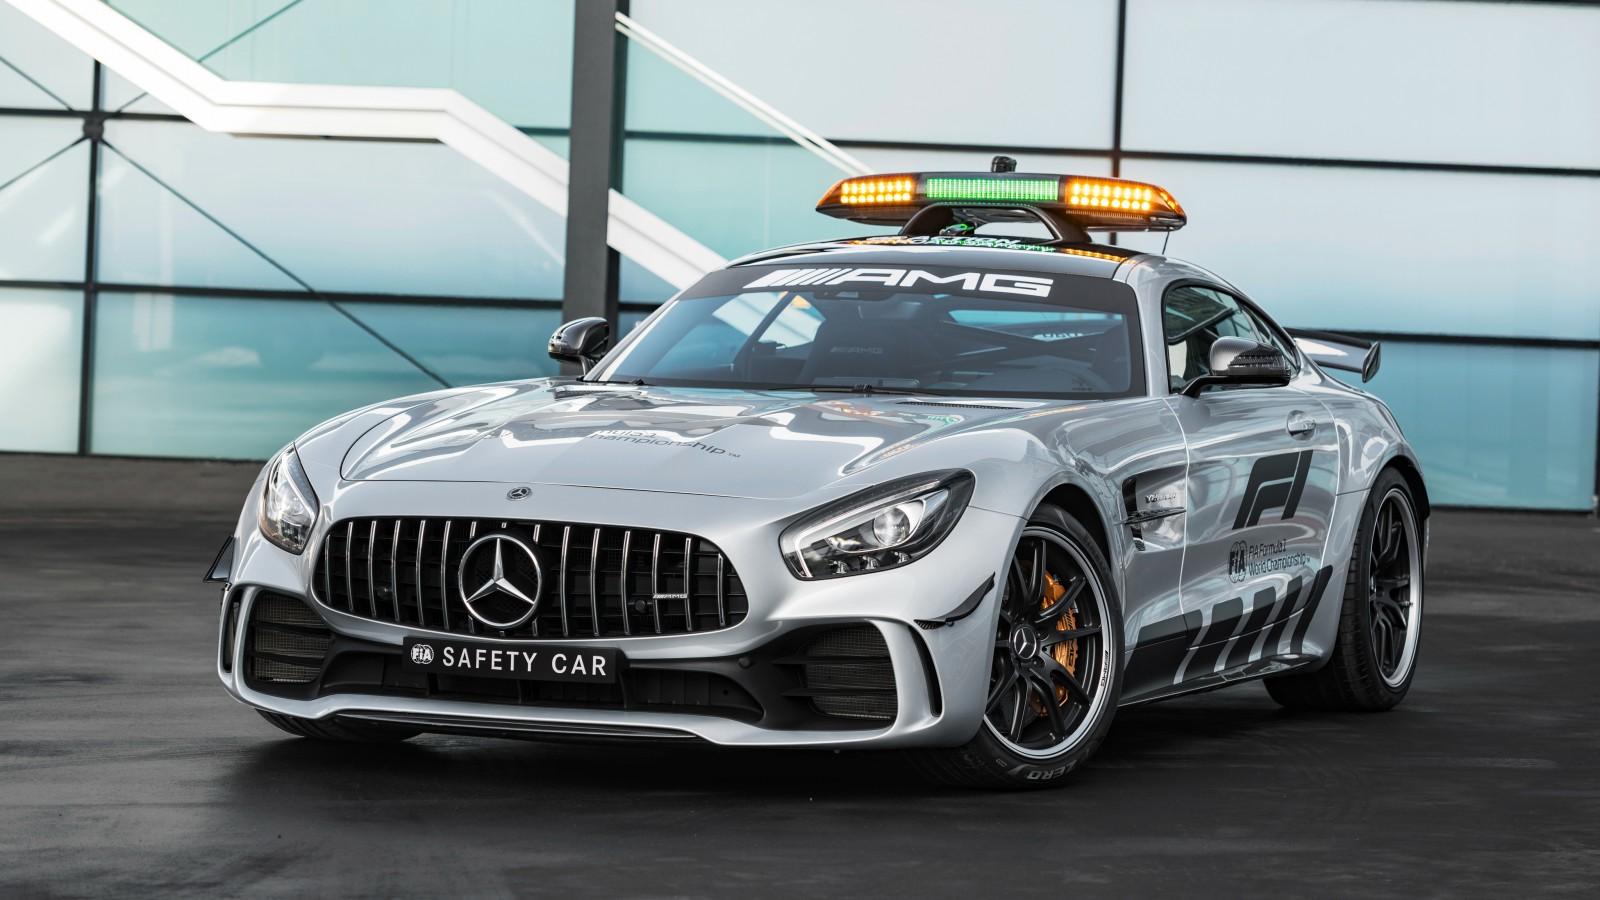 Sport Car Wallpapers Download 2018 Mercedes Amg Gt R F1 Safety Car 4k Wallpaper Hd Car